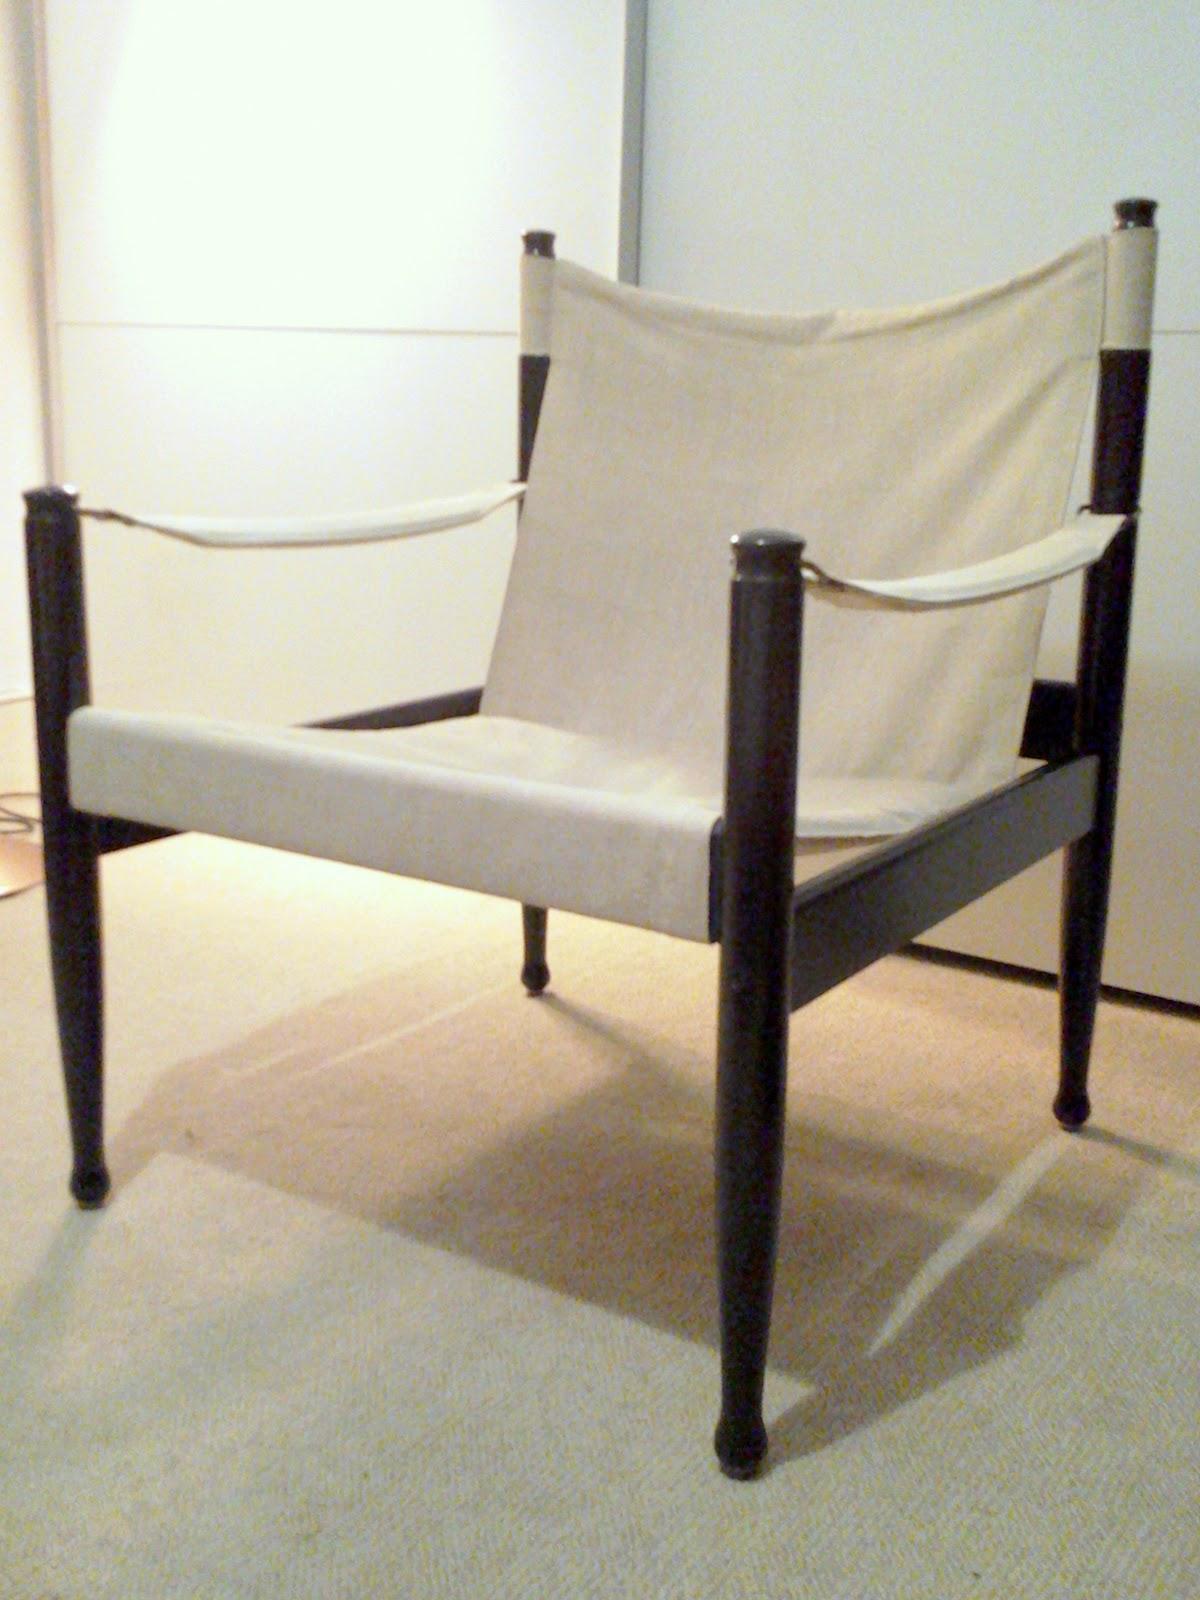 Safari High Chair Imaginarium Lego Activity Table And Set 1960s Retro Danish Eilersen Anddansk